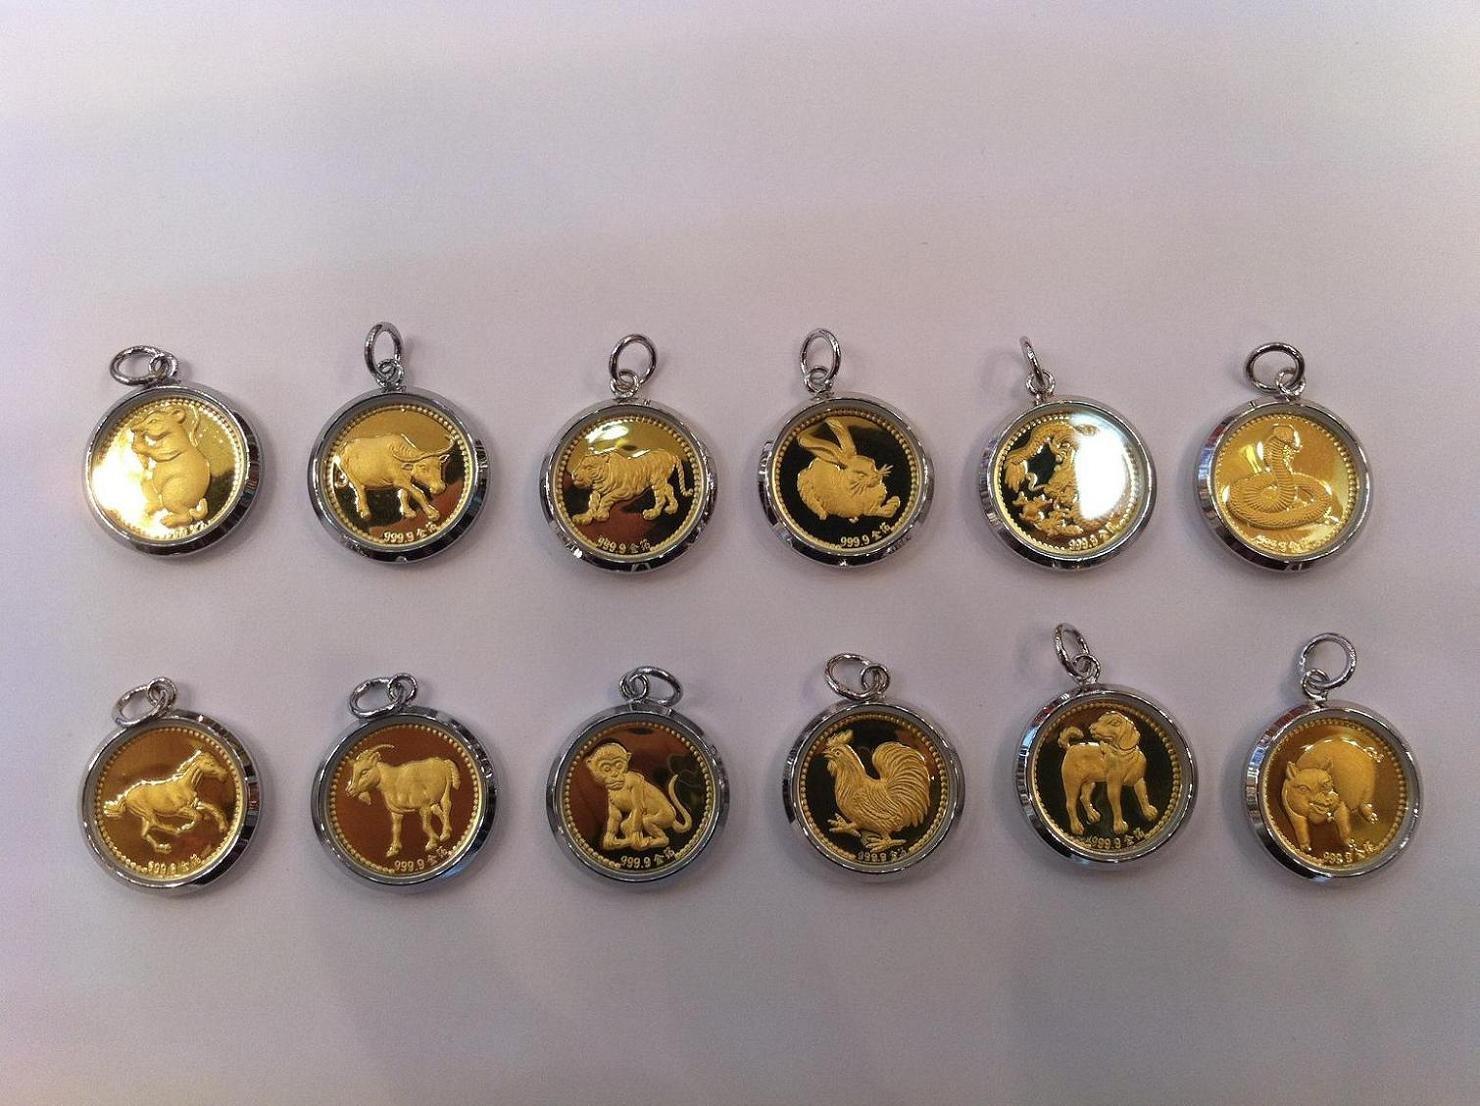 Hong Kong Post Free shipping, wholesale, retail, 1 pc/lot, 12 Chinese Zodiac Gold Plated pendant, rolled gold charms(Hong Kong)